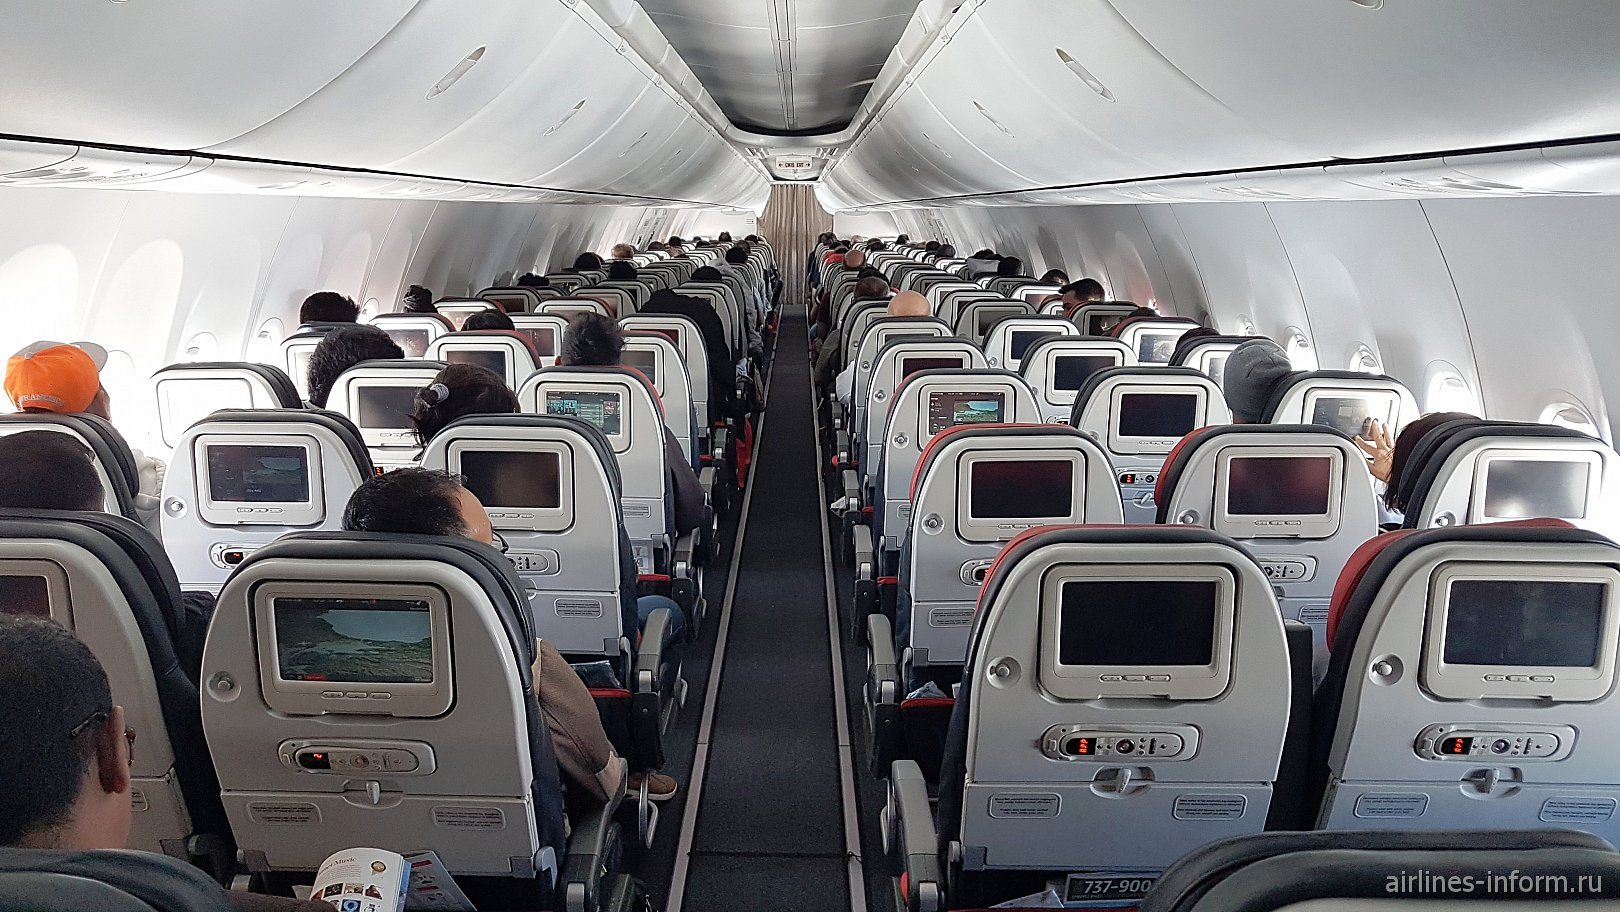 Пассажирский салон самолета Боинг-737-900 Турецких авиалиний